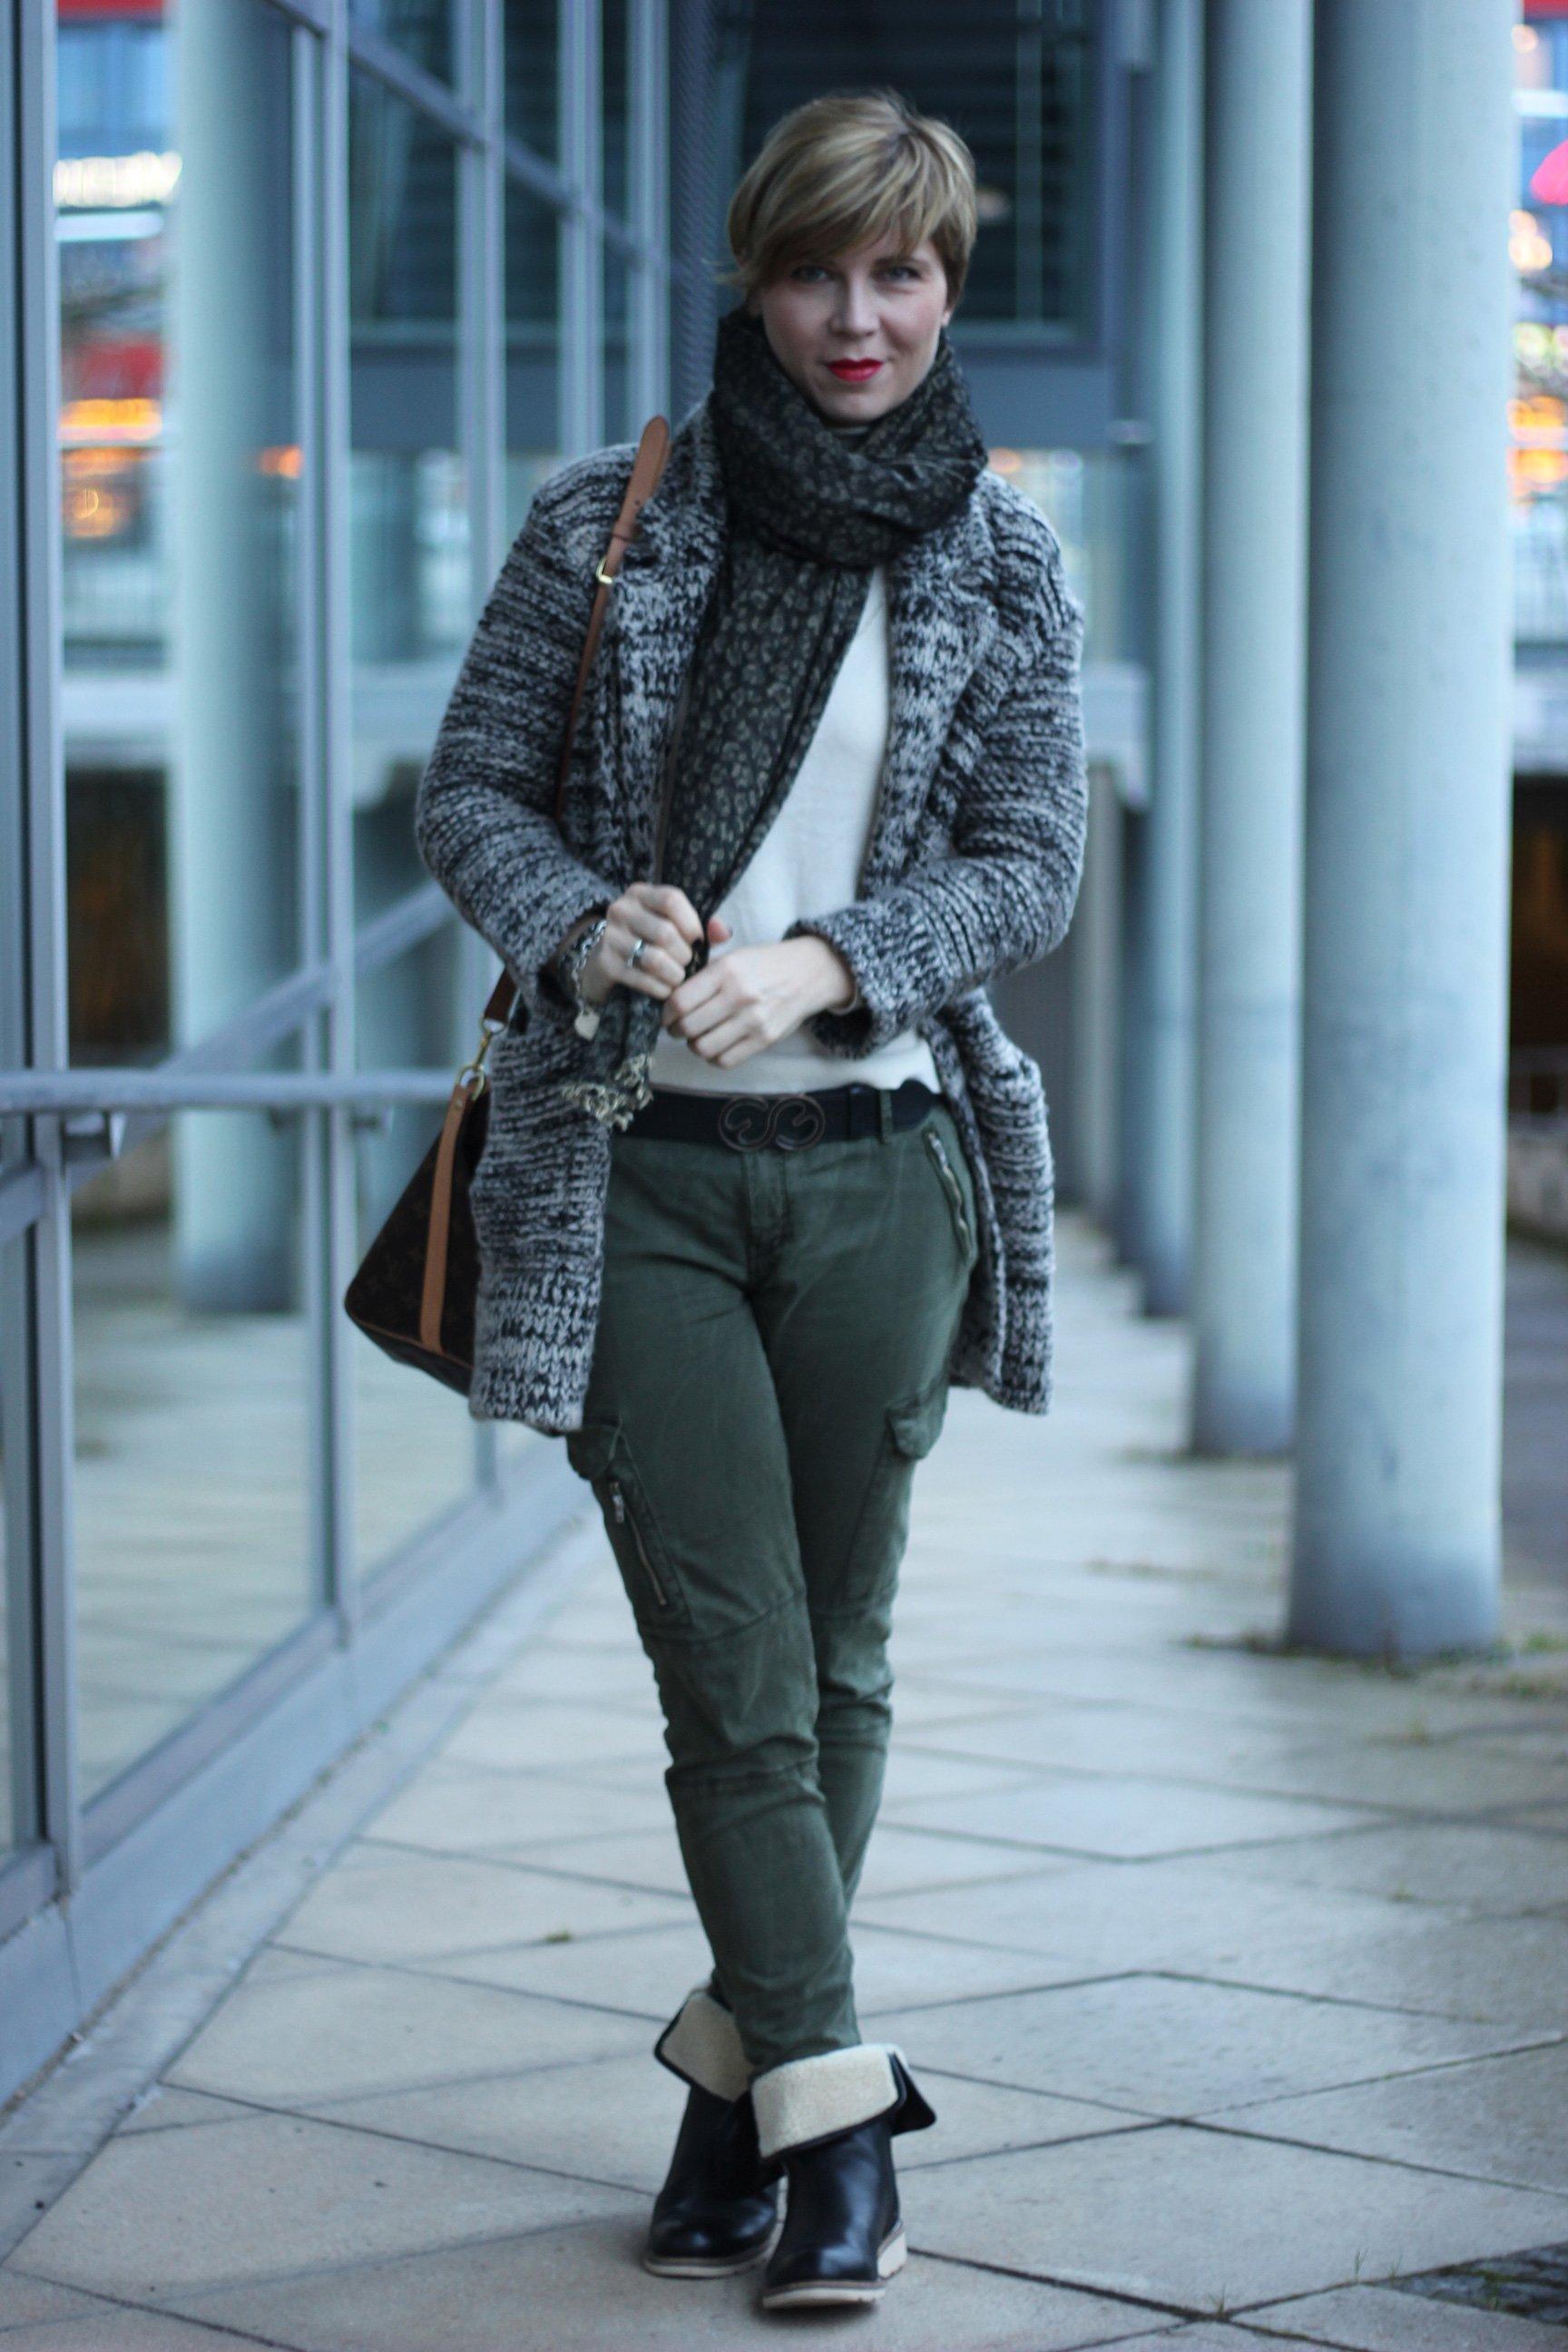 IMG_2278a_Zara_Cardigan_KhakiPants_Casual_Conny_Ahemadundahos_turtlenecksweater_Rollkragen_beige_Airfield_jacke